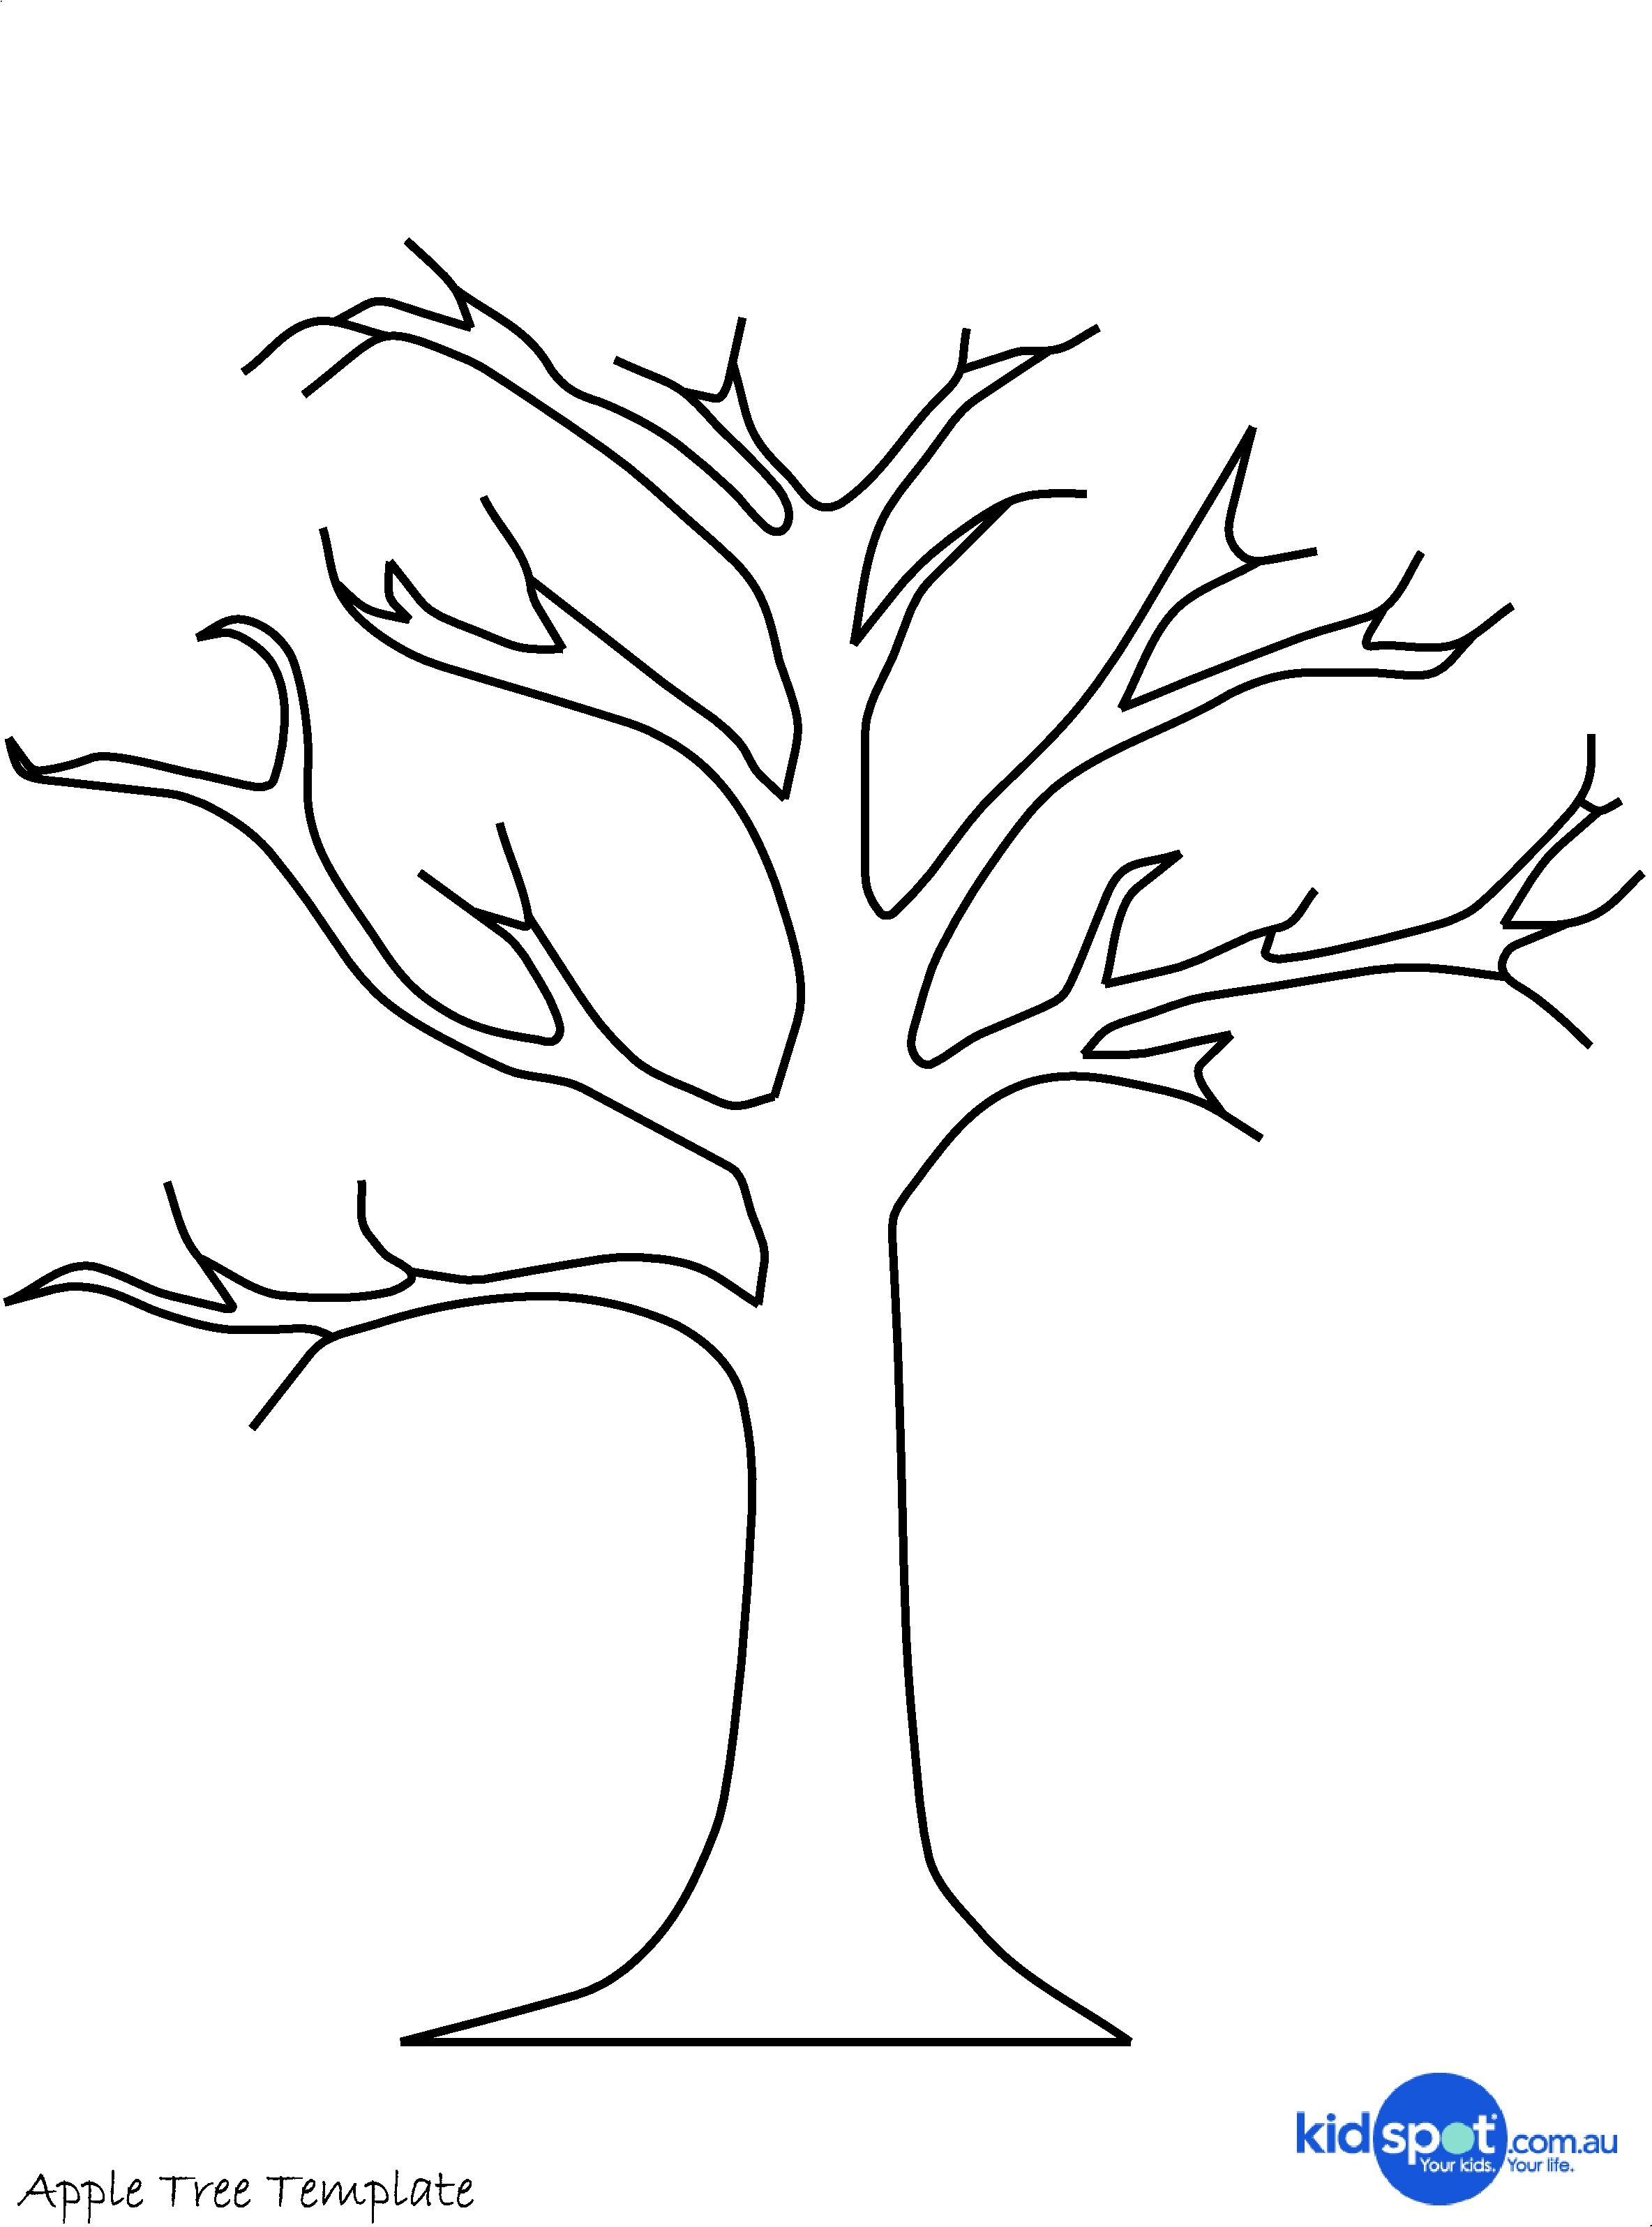 Printable Tree Template   Tree Craft - Cork Stamp Apple Tree - Art - Free Printable Palm Tree Template